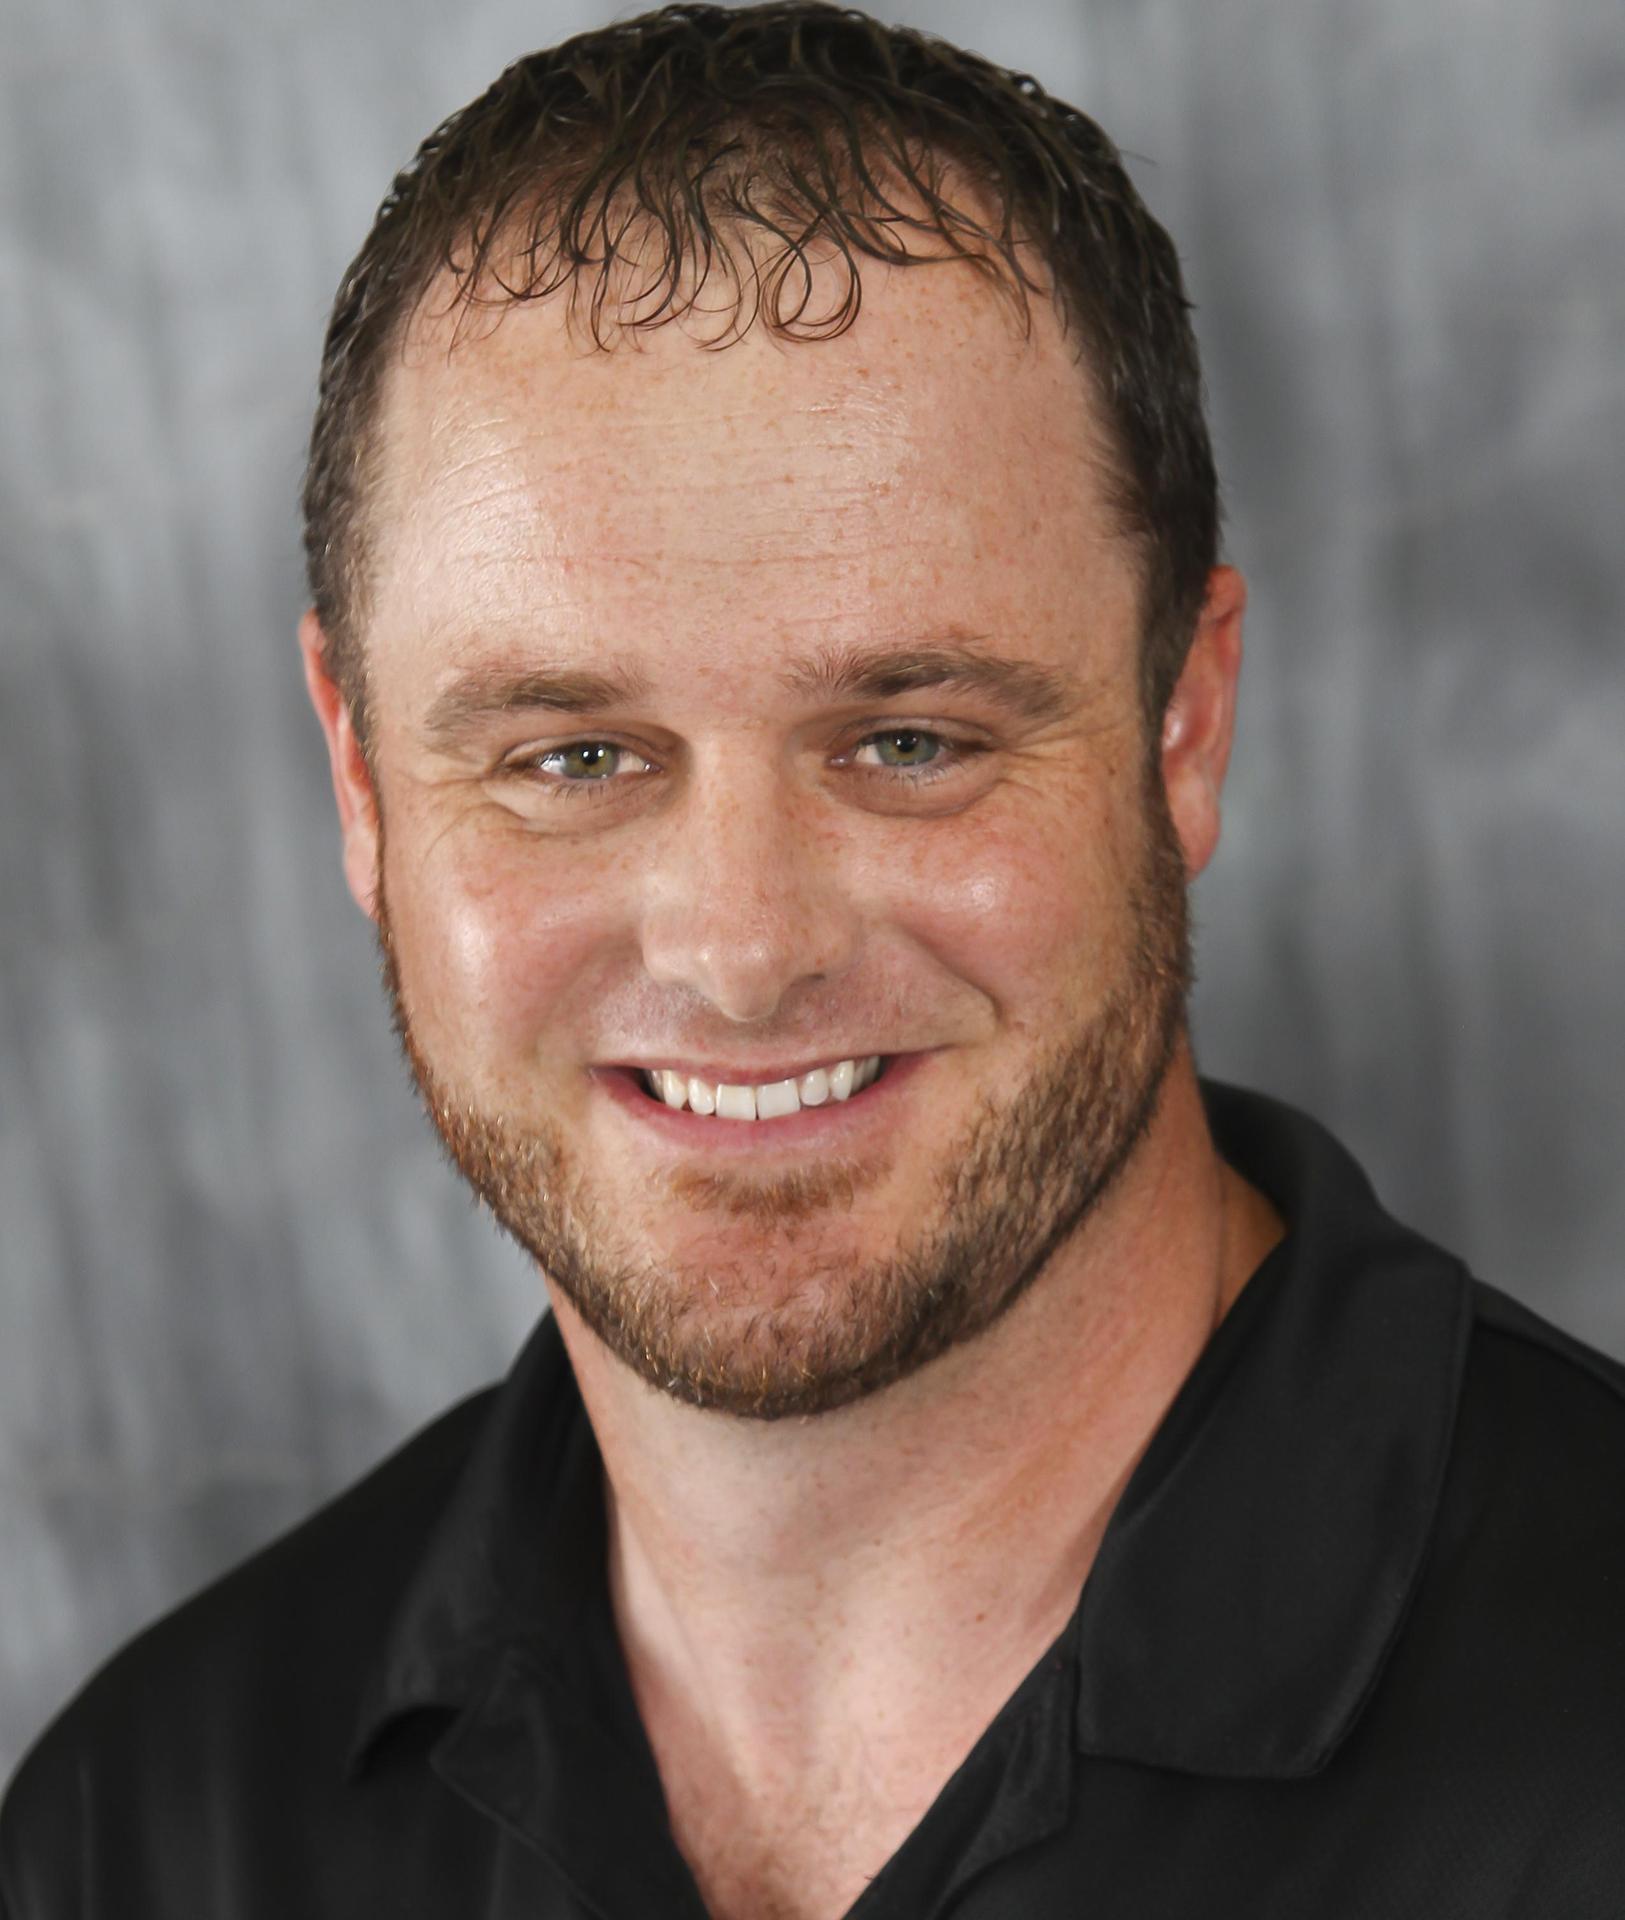 Bennett Christianson for Campus Life